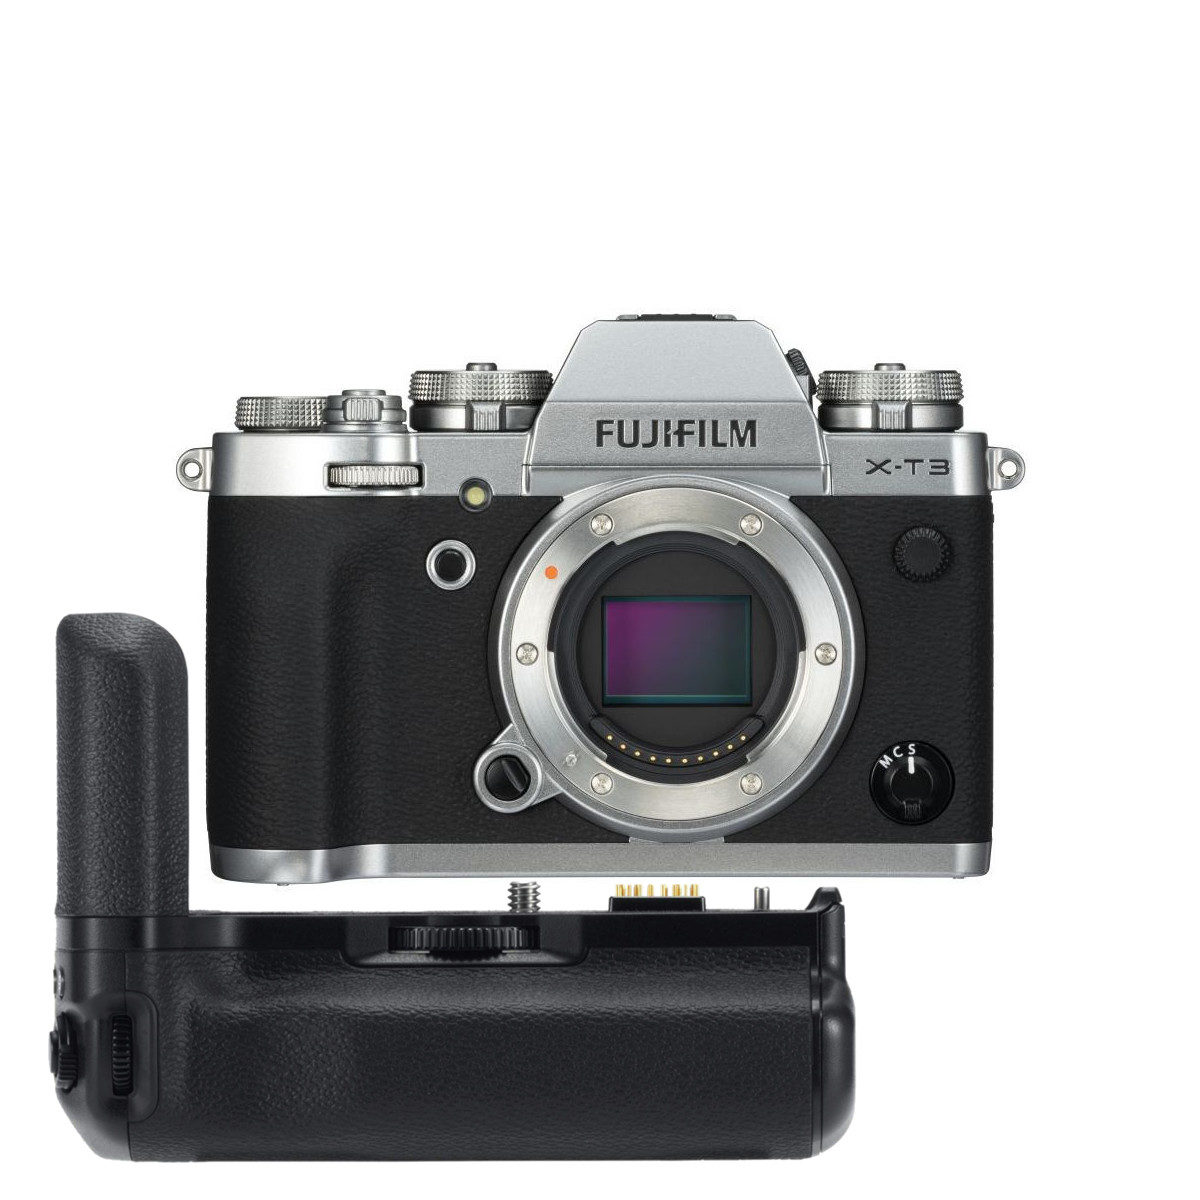 Fujifilm X-T3 systeemcamera Zilver + VG-XT3 Battery Grip